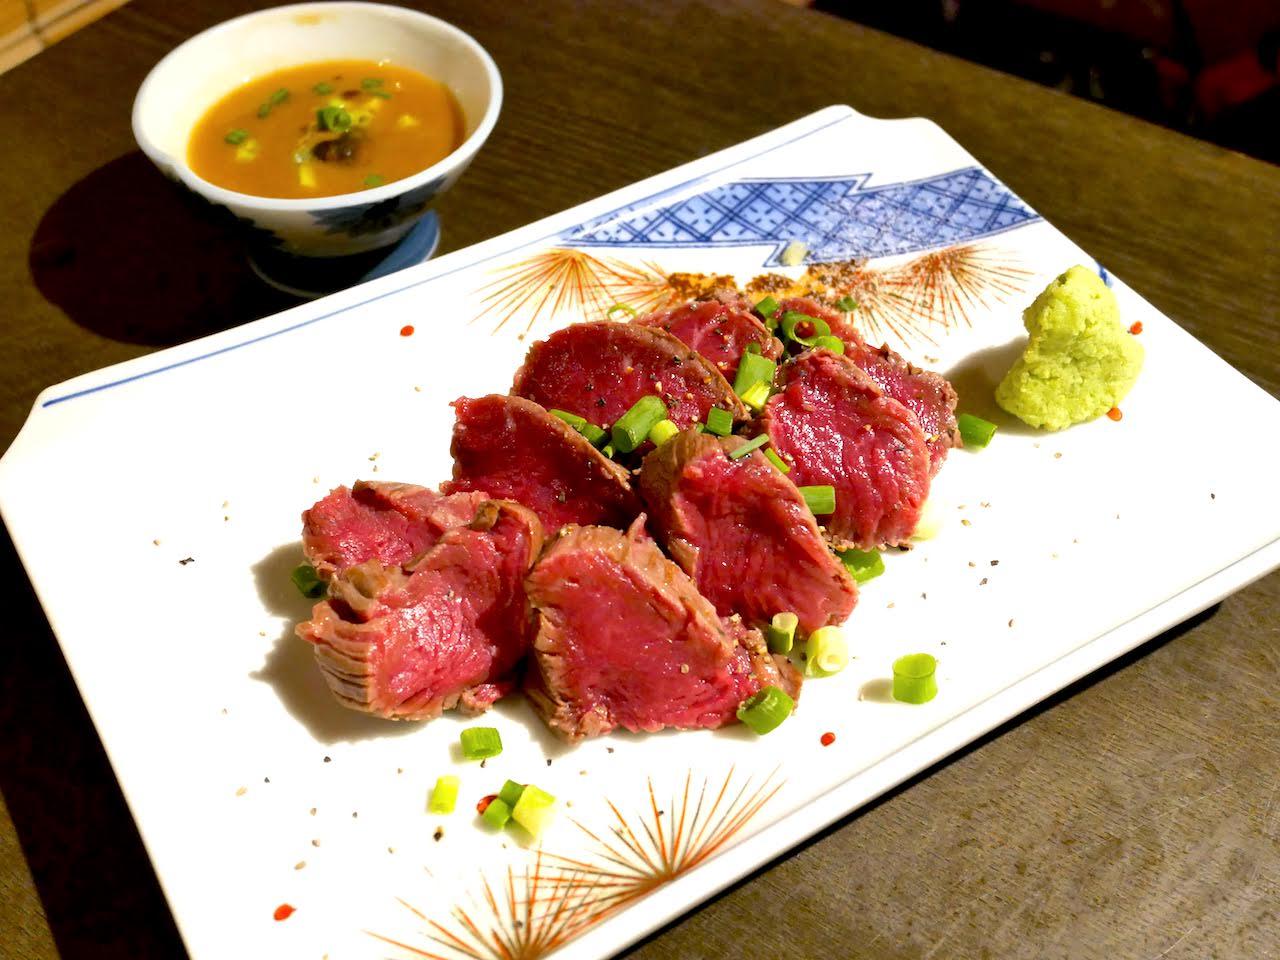 http://dinner.tokyo-review.com/images/1120234.jpg